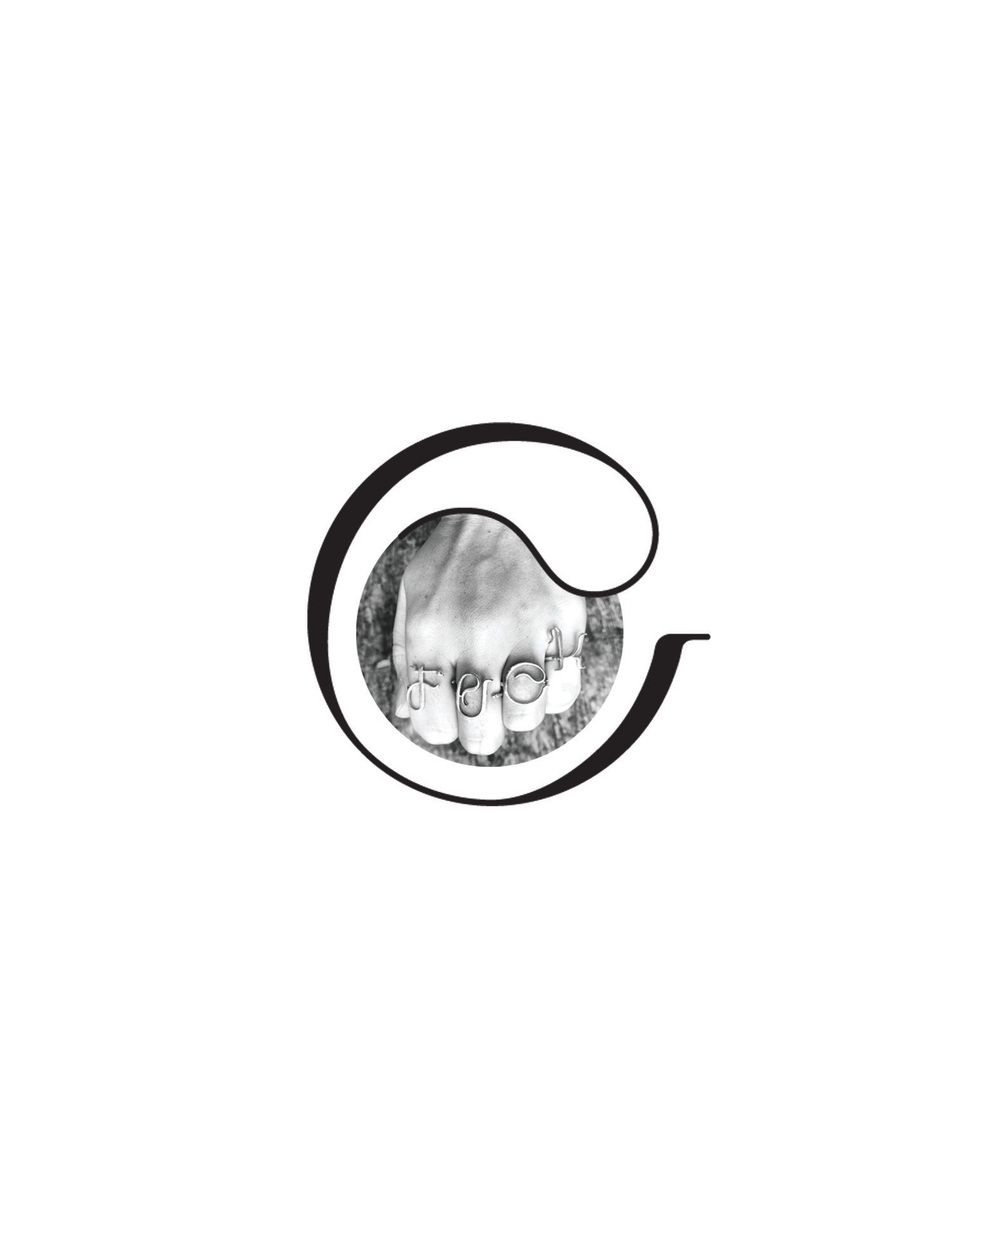 paula-walden-calligra-3.jpg